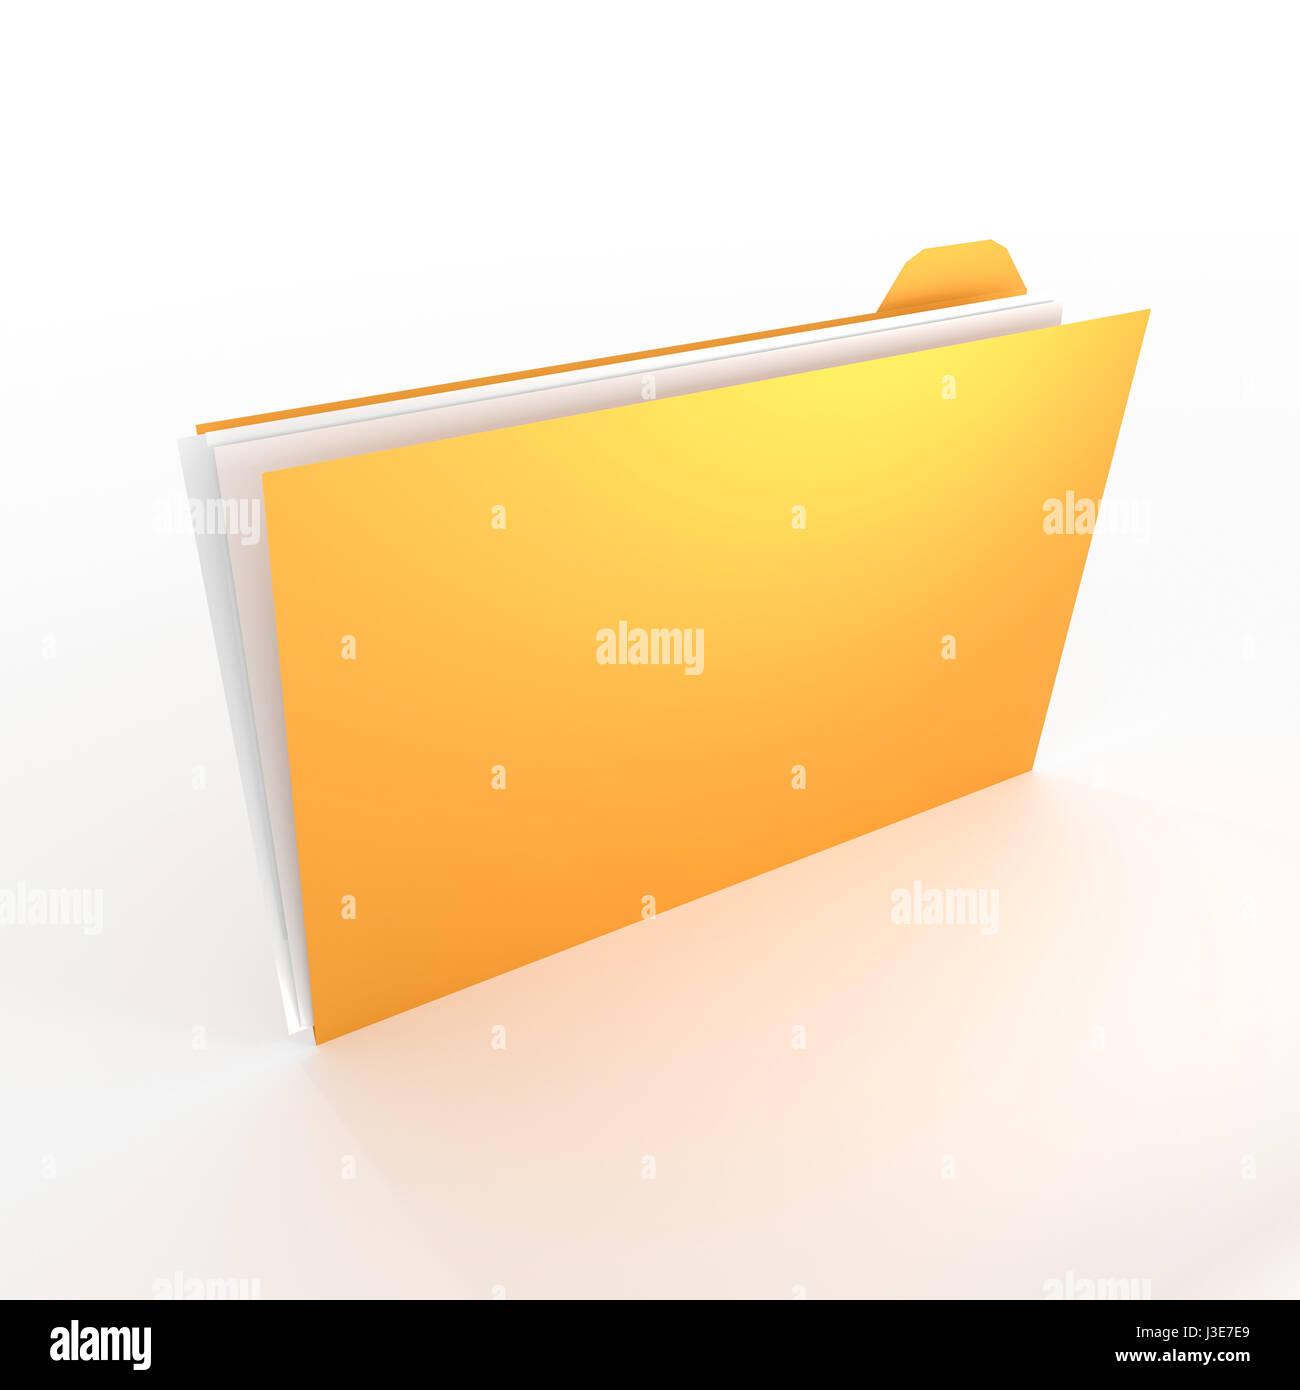 3D Ordner Konzept - ideal für Themen wie Büro, Dokumente, Daten, Forschung usw.. Stockbild